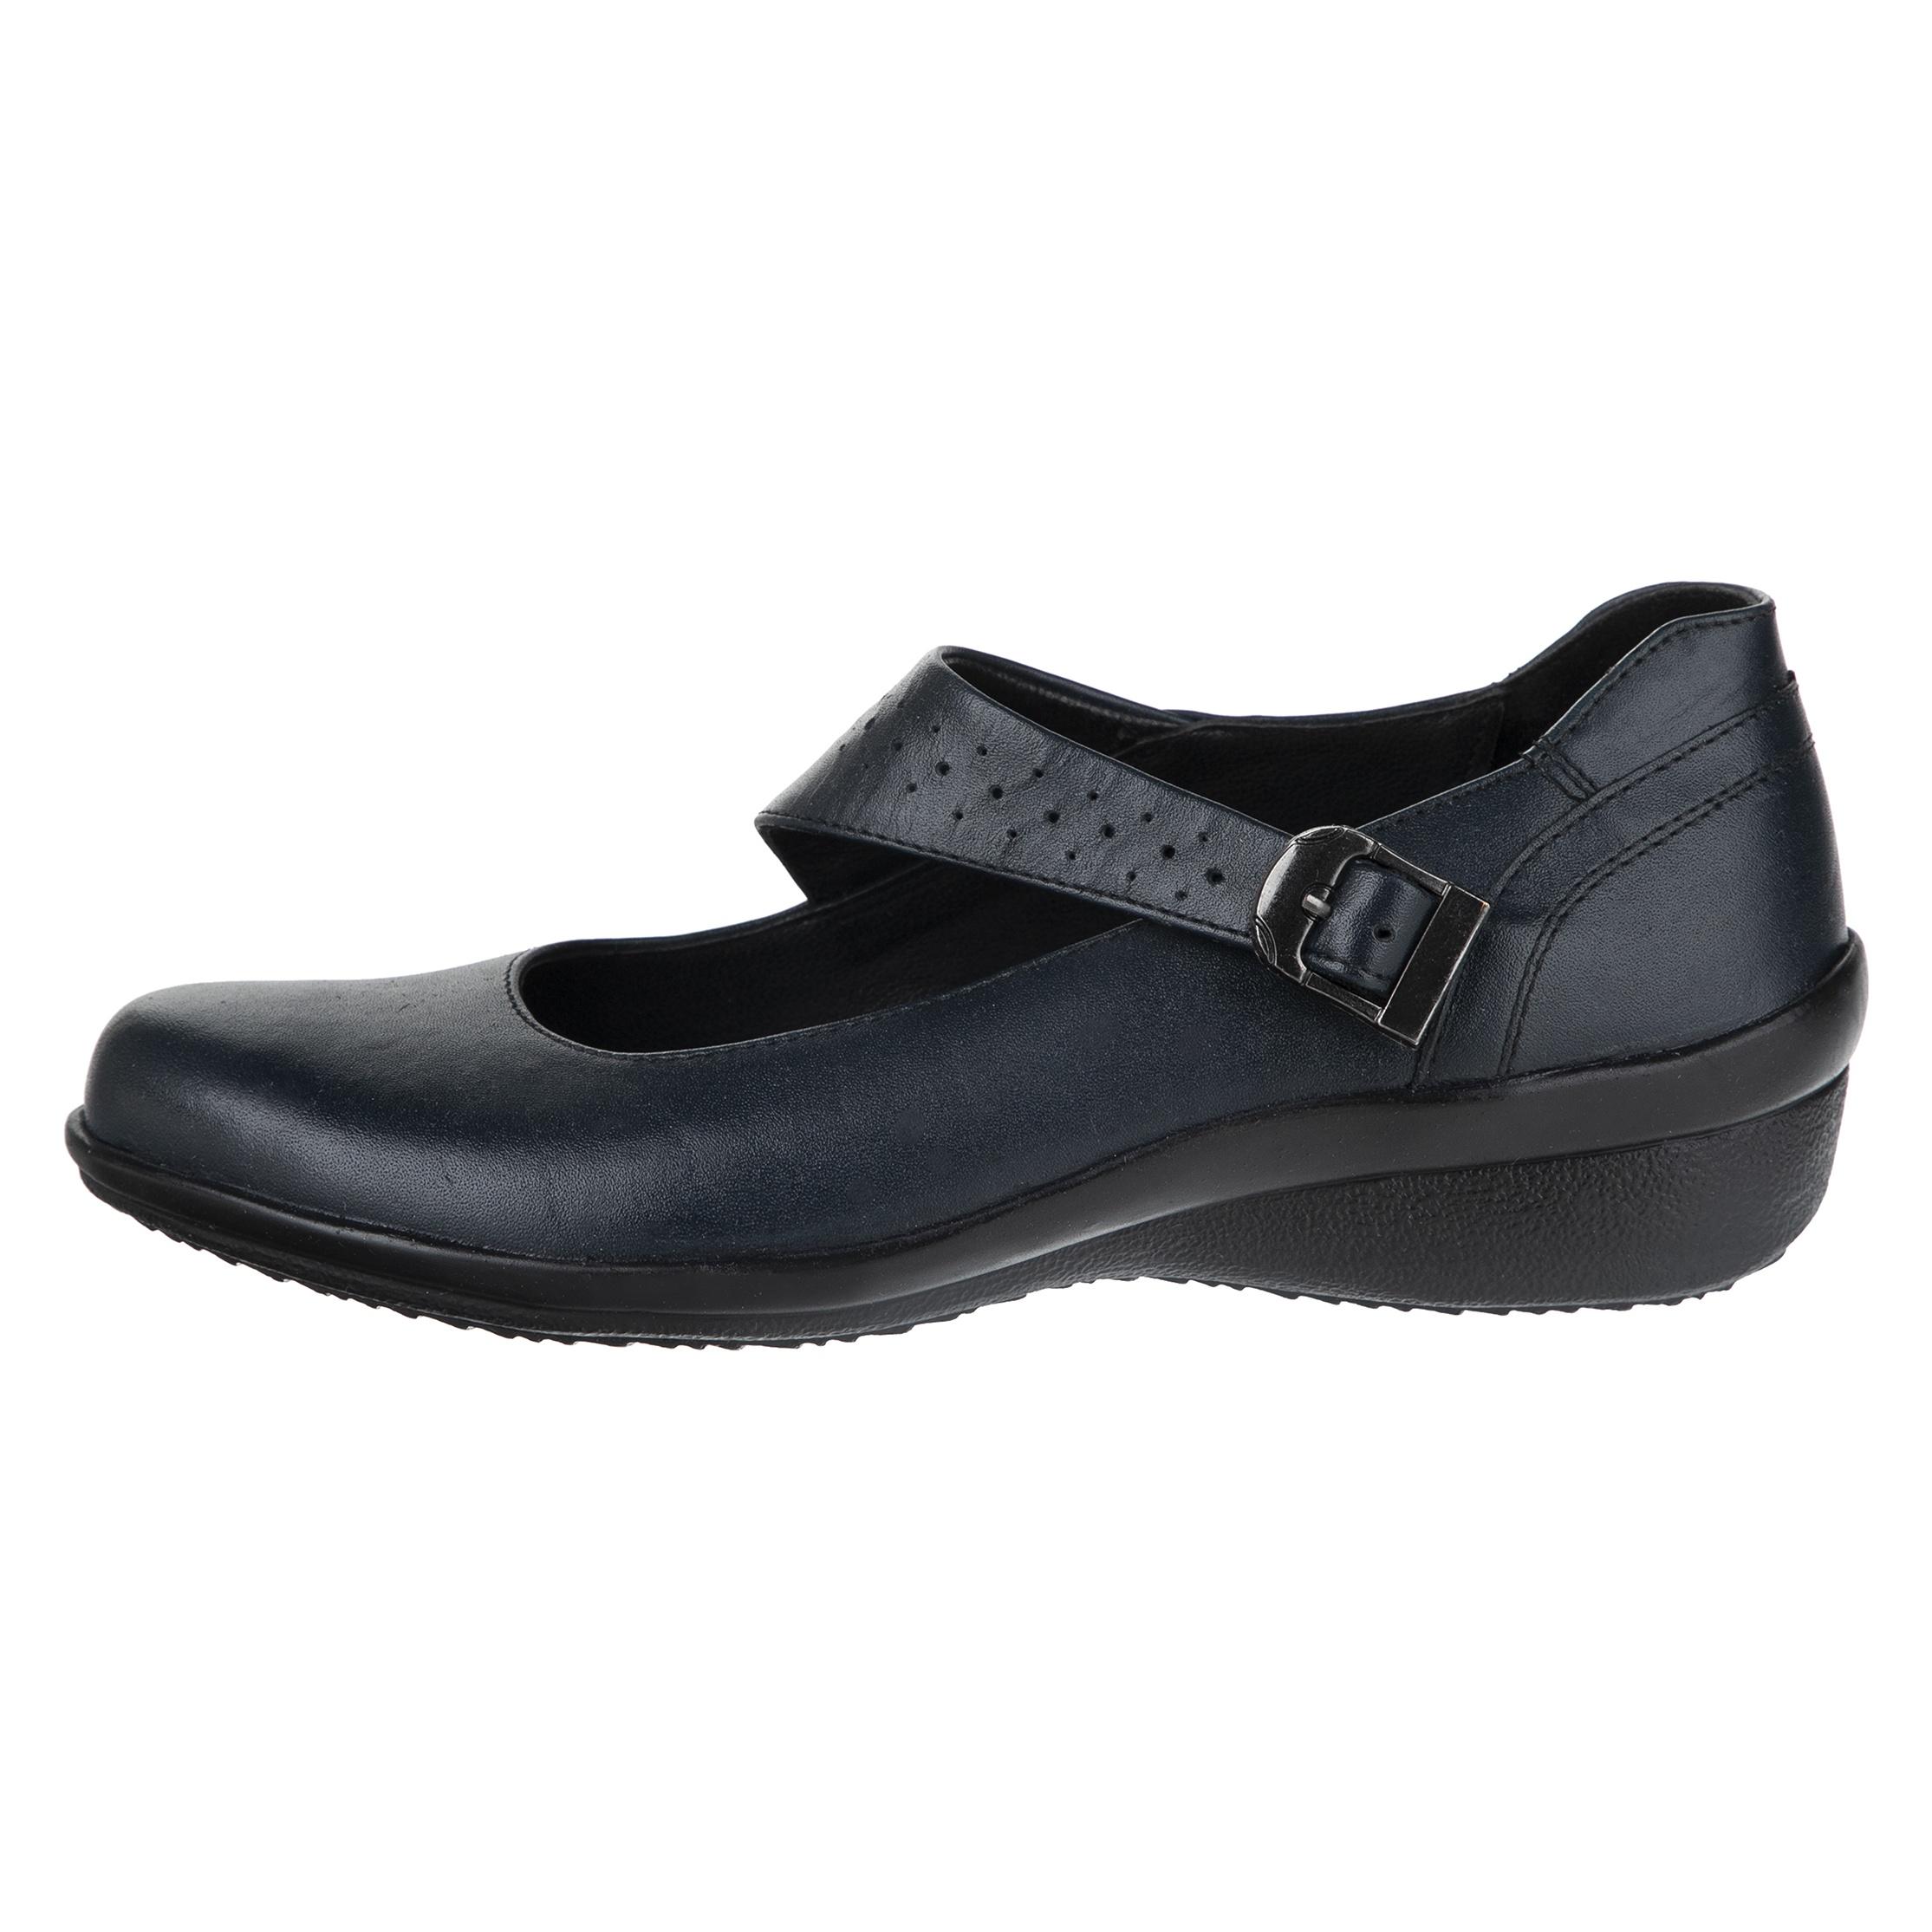 کفش روزمره زنانه دانادل DN5096C-103